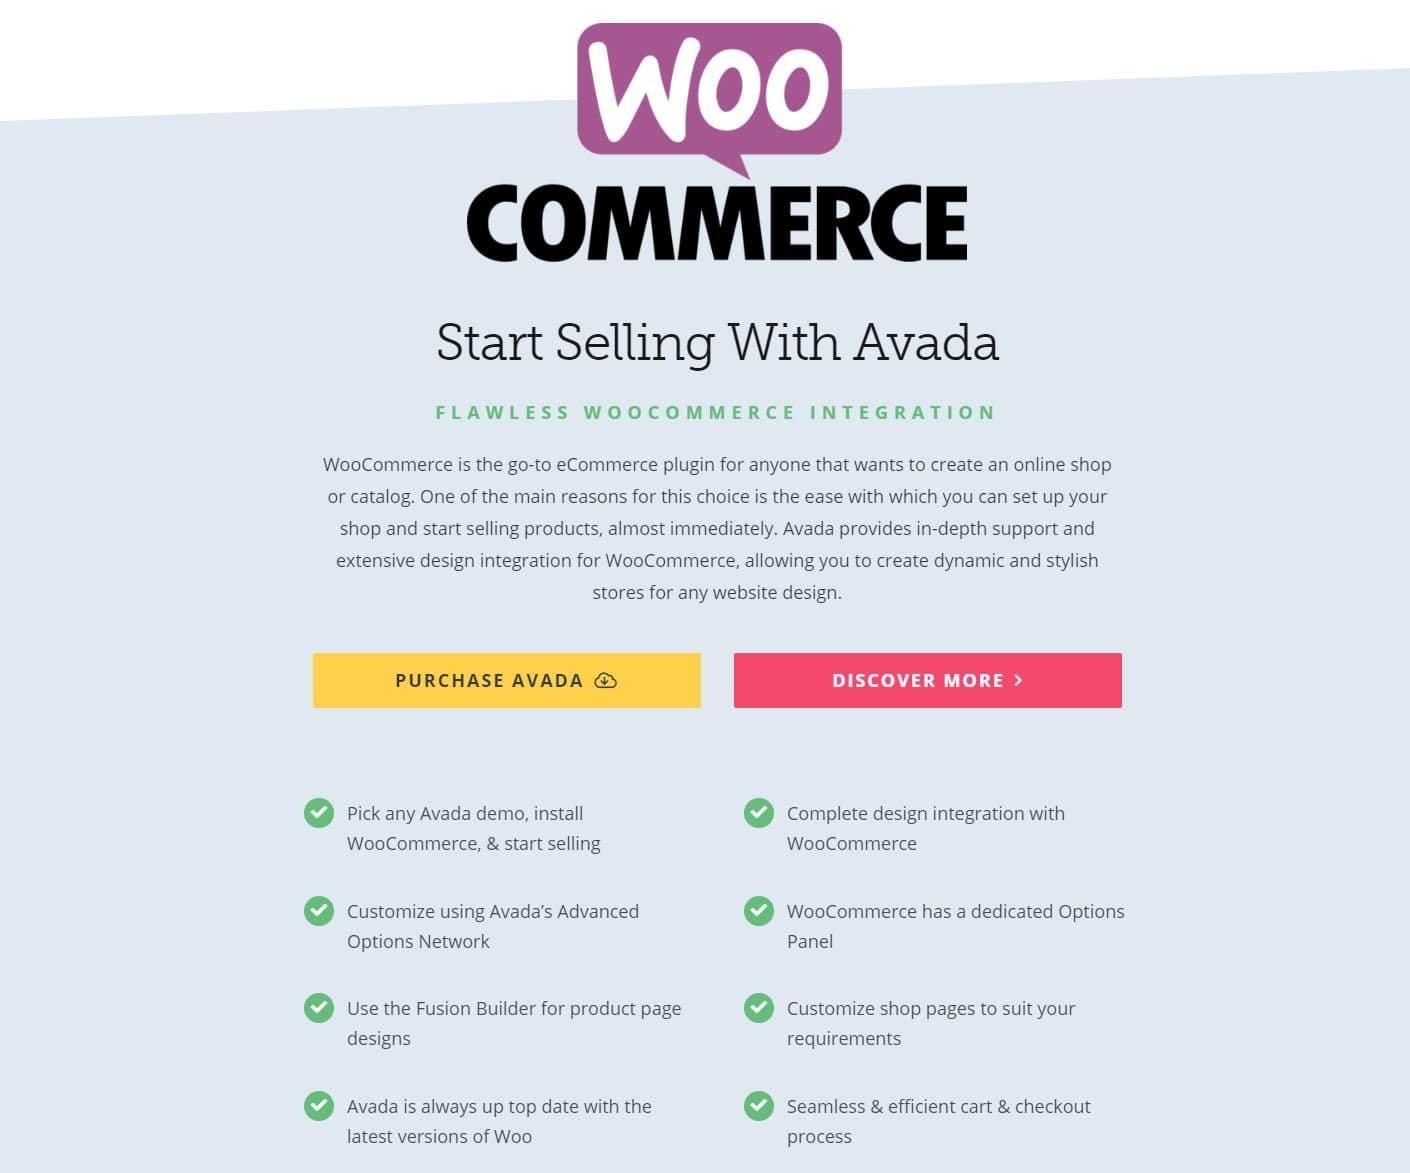 Avada-WooCommerce